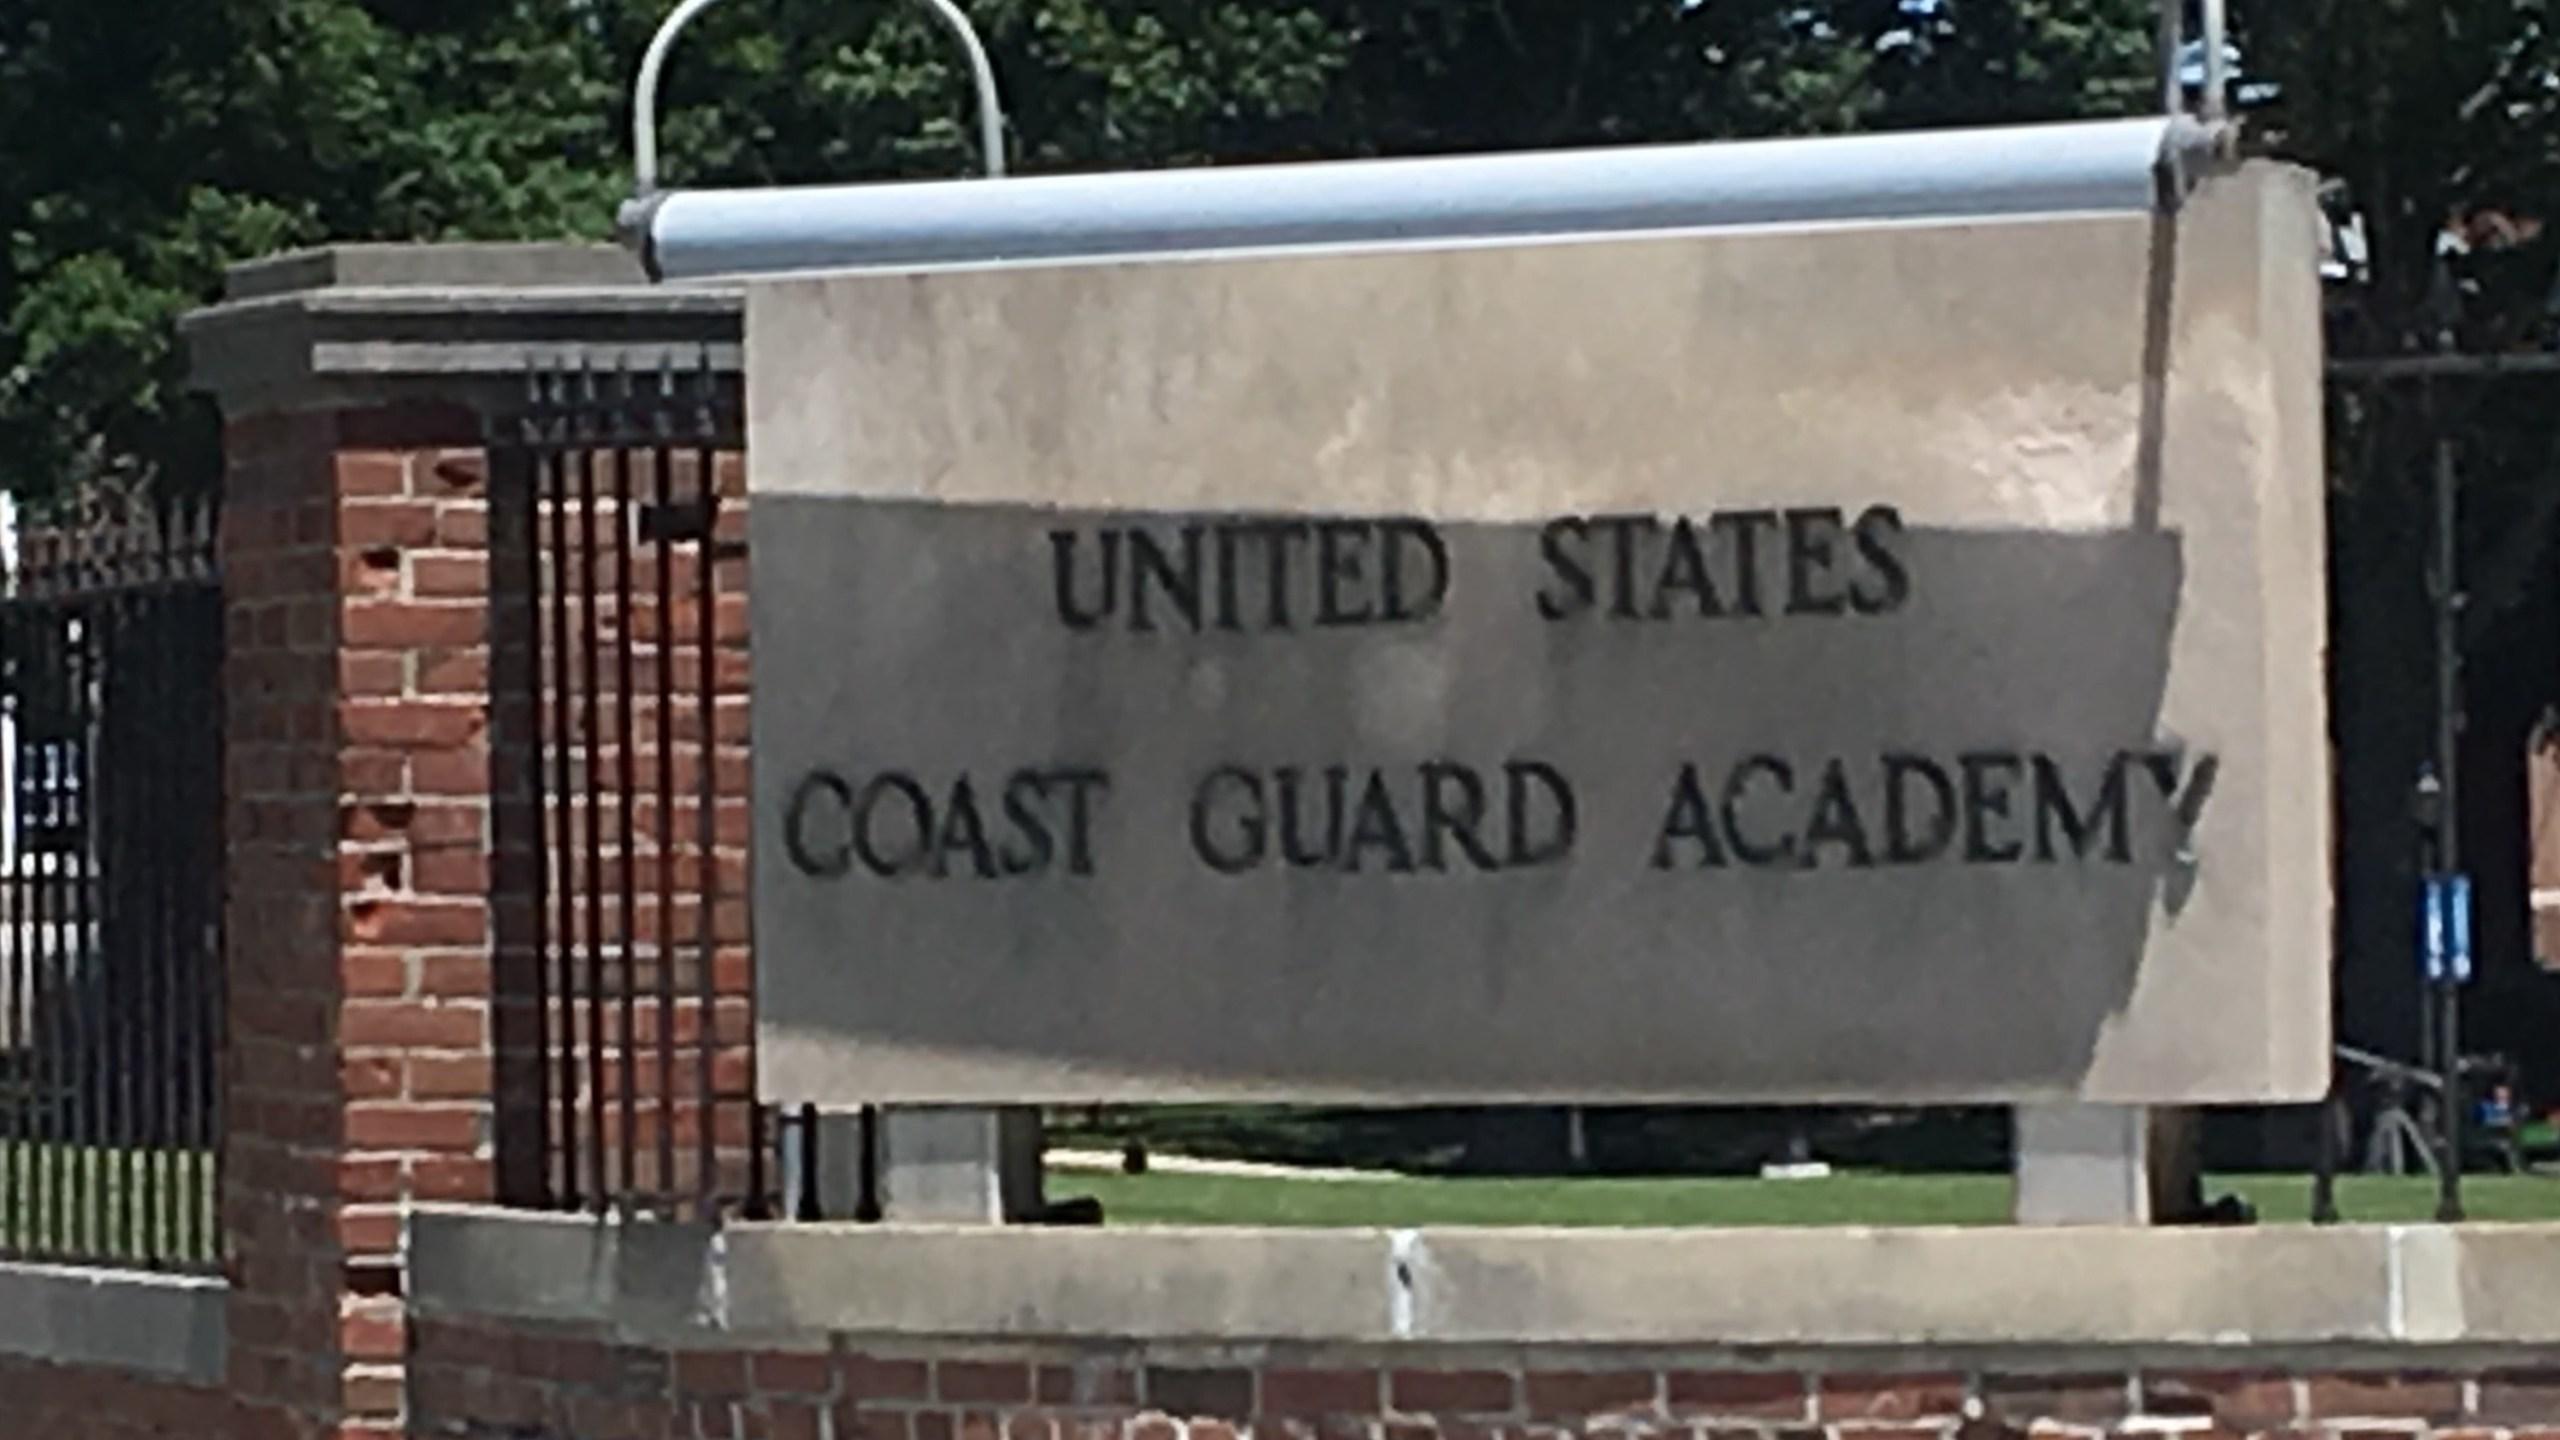 USCG United States Coast Guard Academy